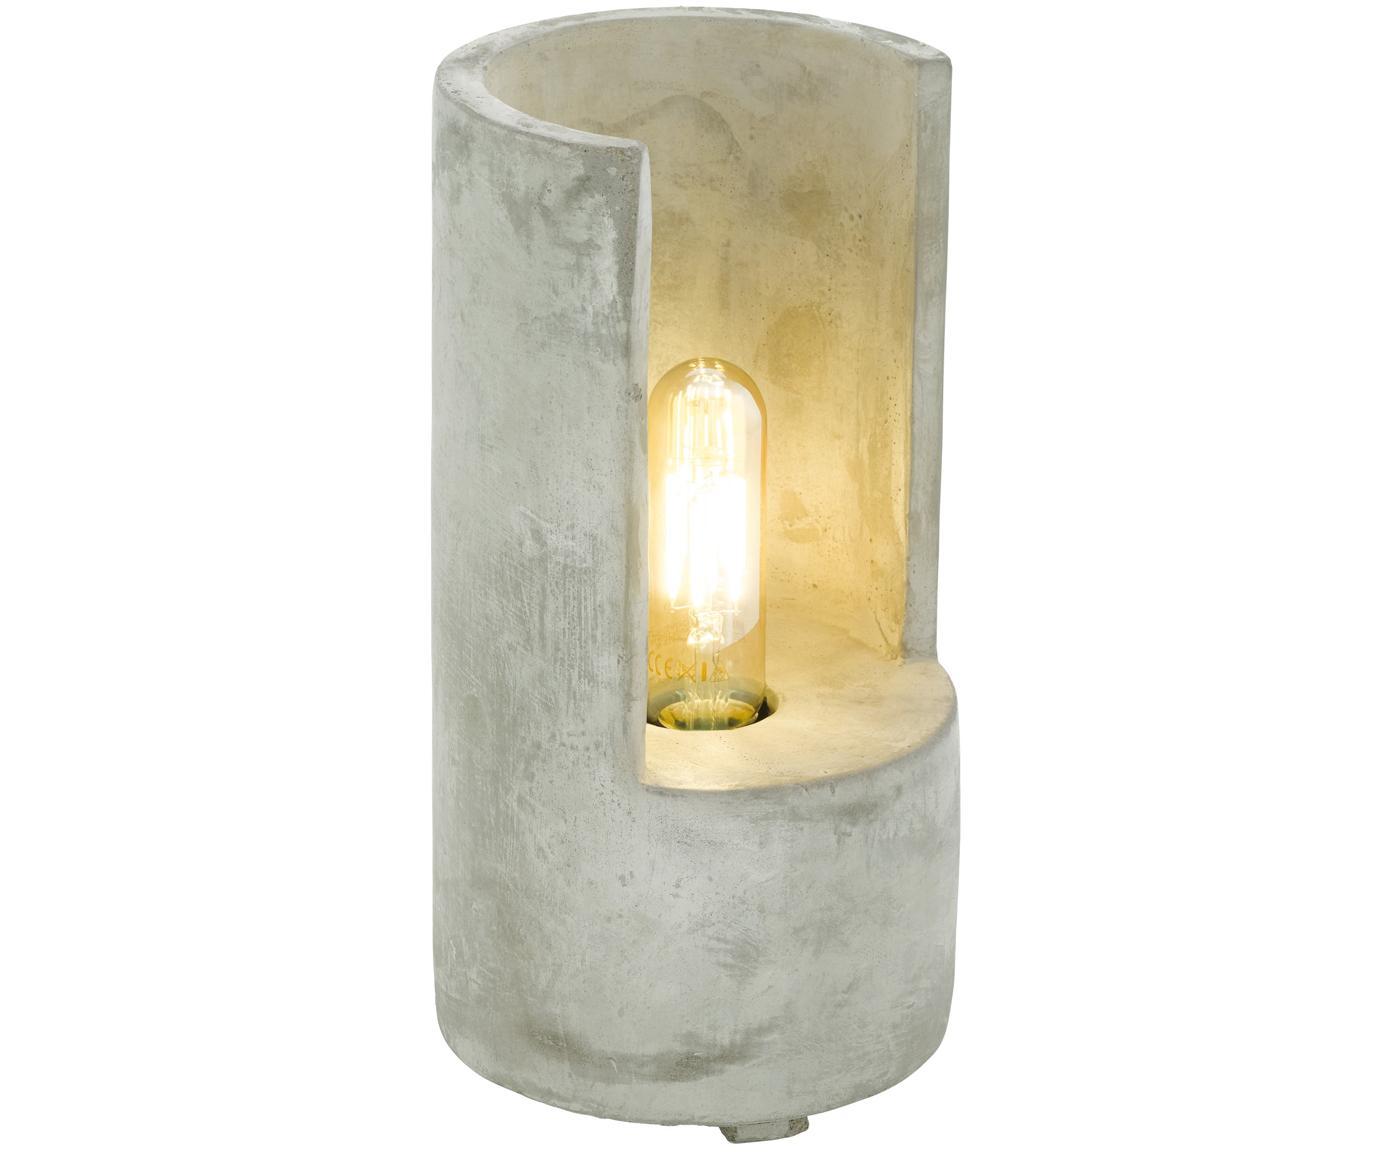 Beton-Tischlampe Lynton, Betongrau, Ø 14 x H 27 cm